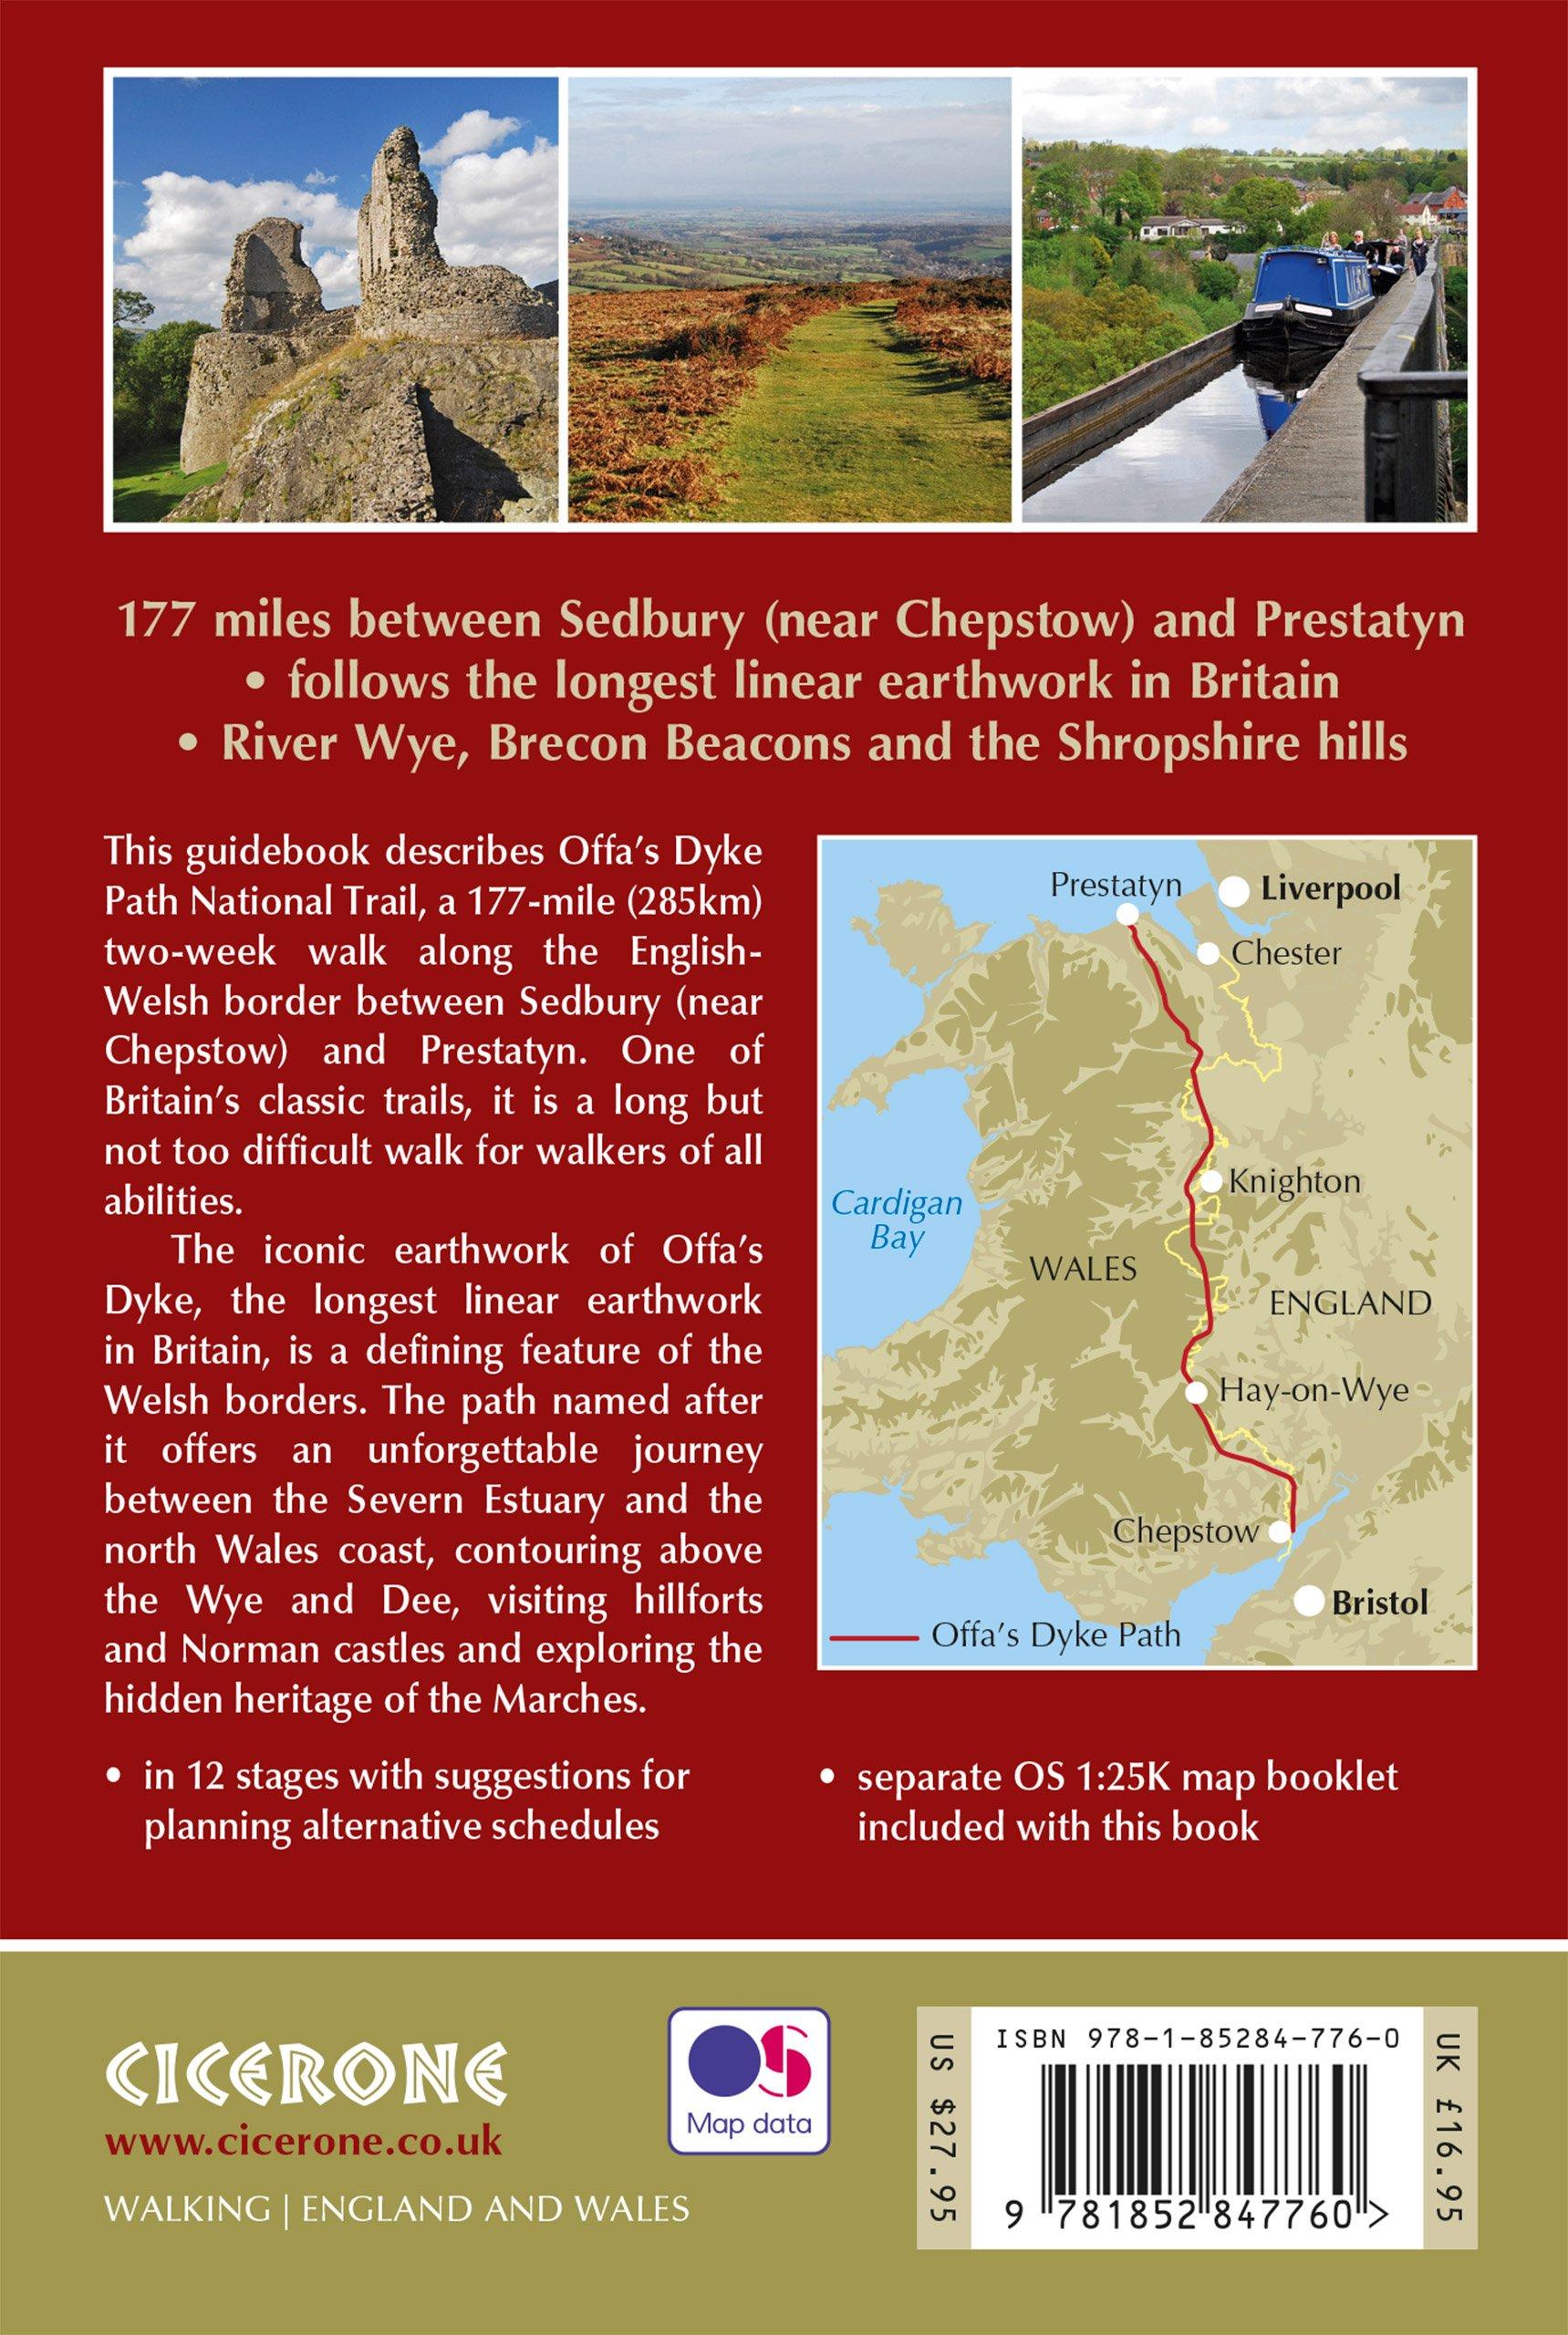 Walking Offas Dyke Path Following the English-Welsh Border